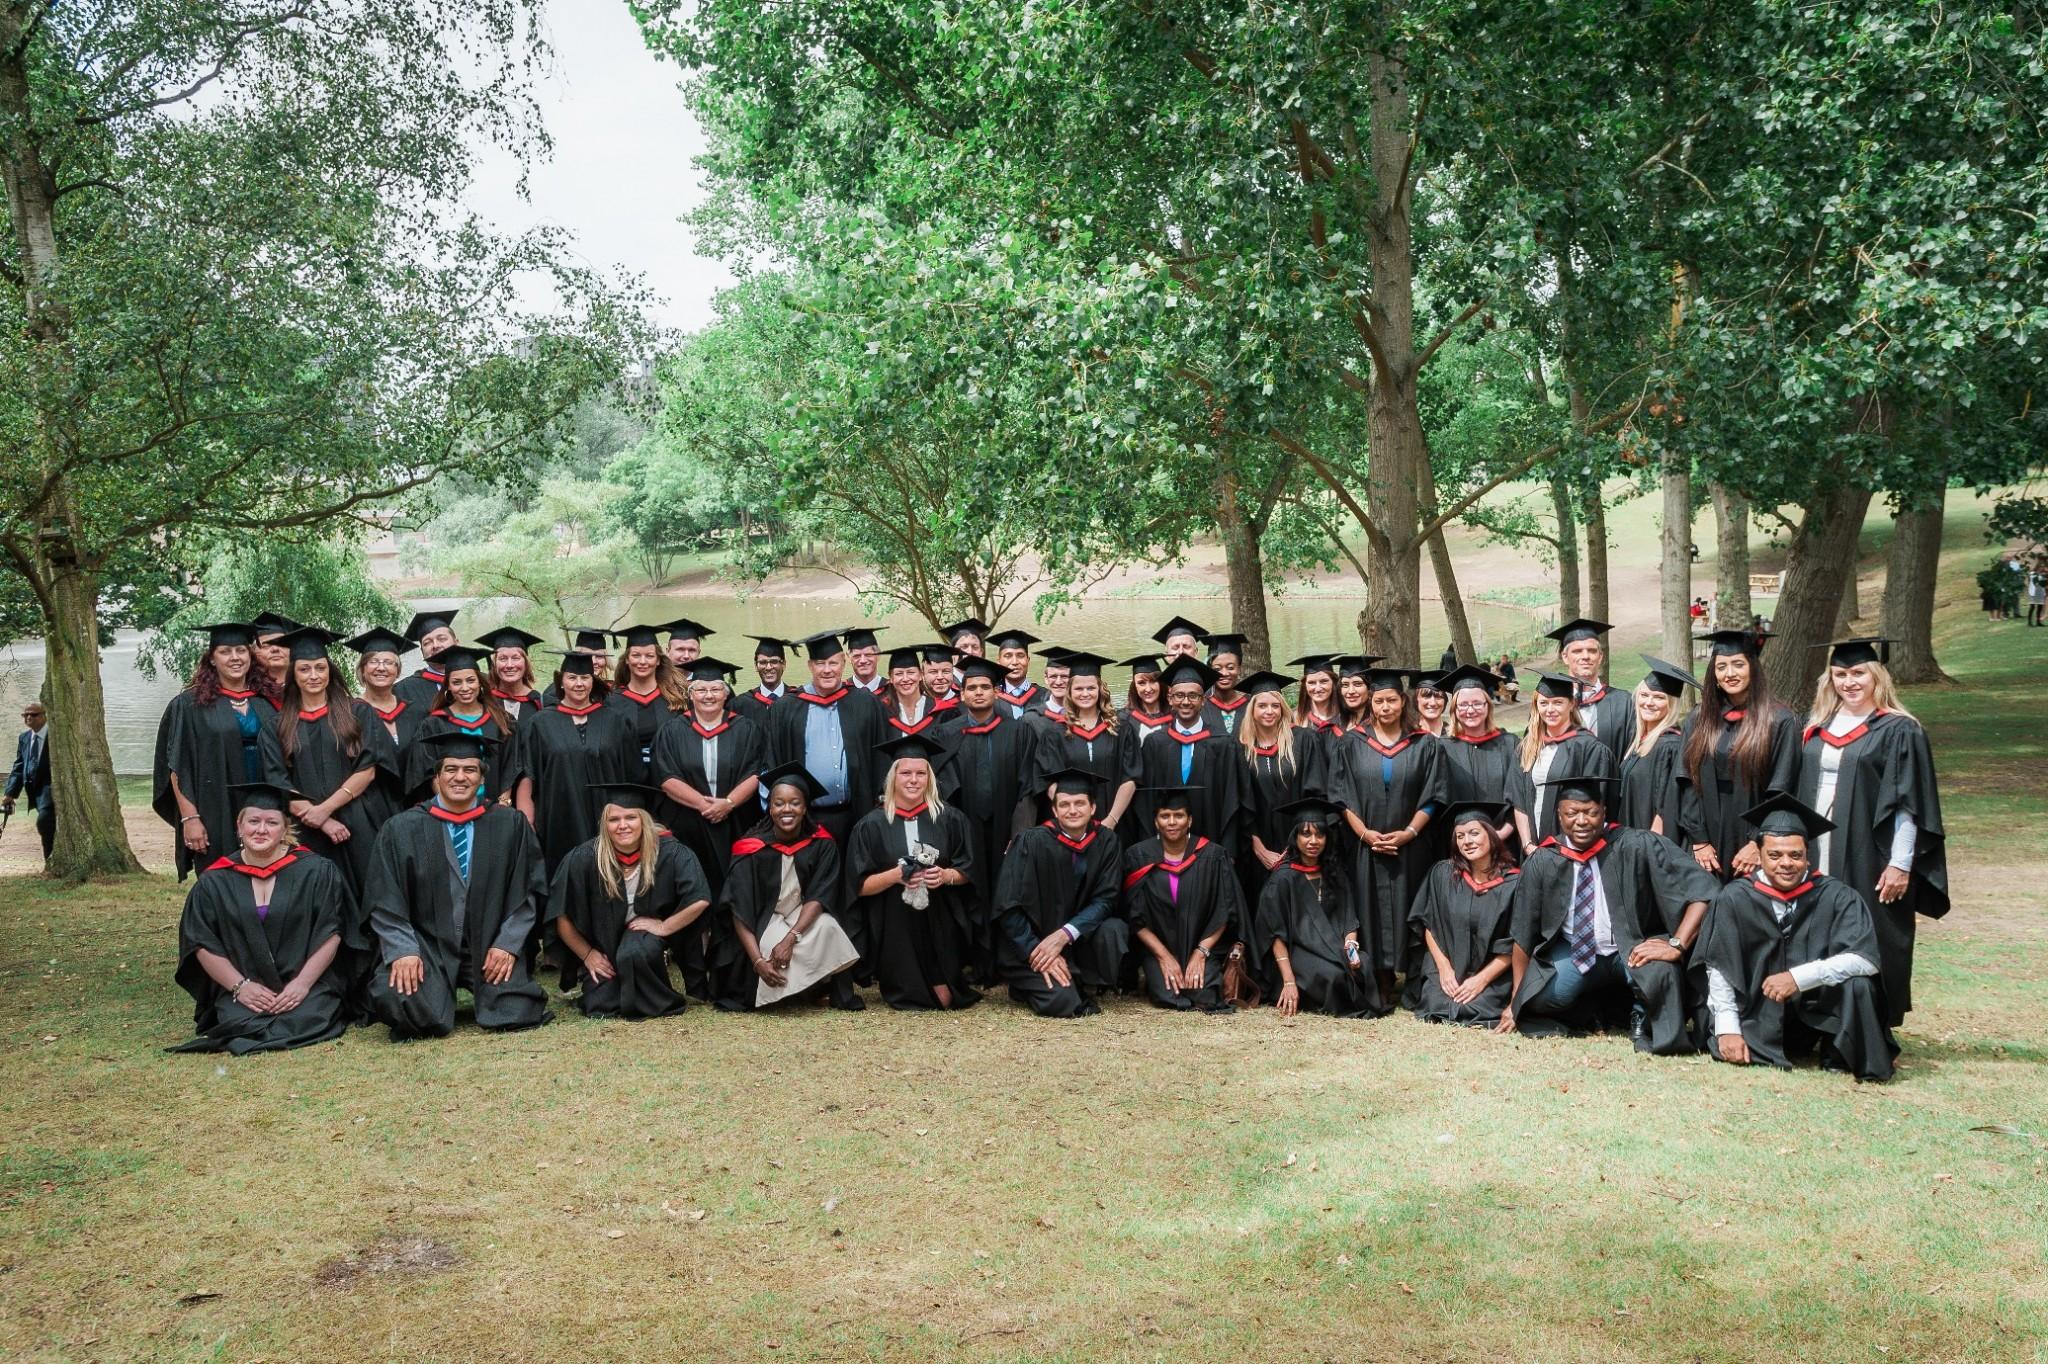 2015 Graduates group shot